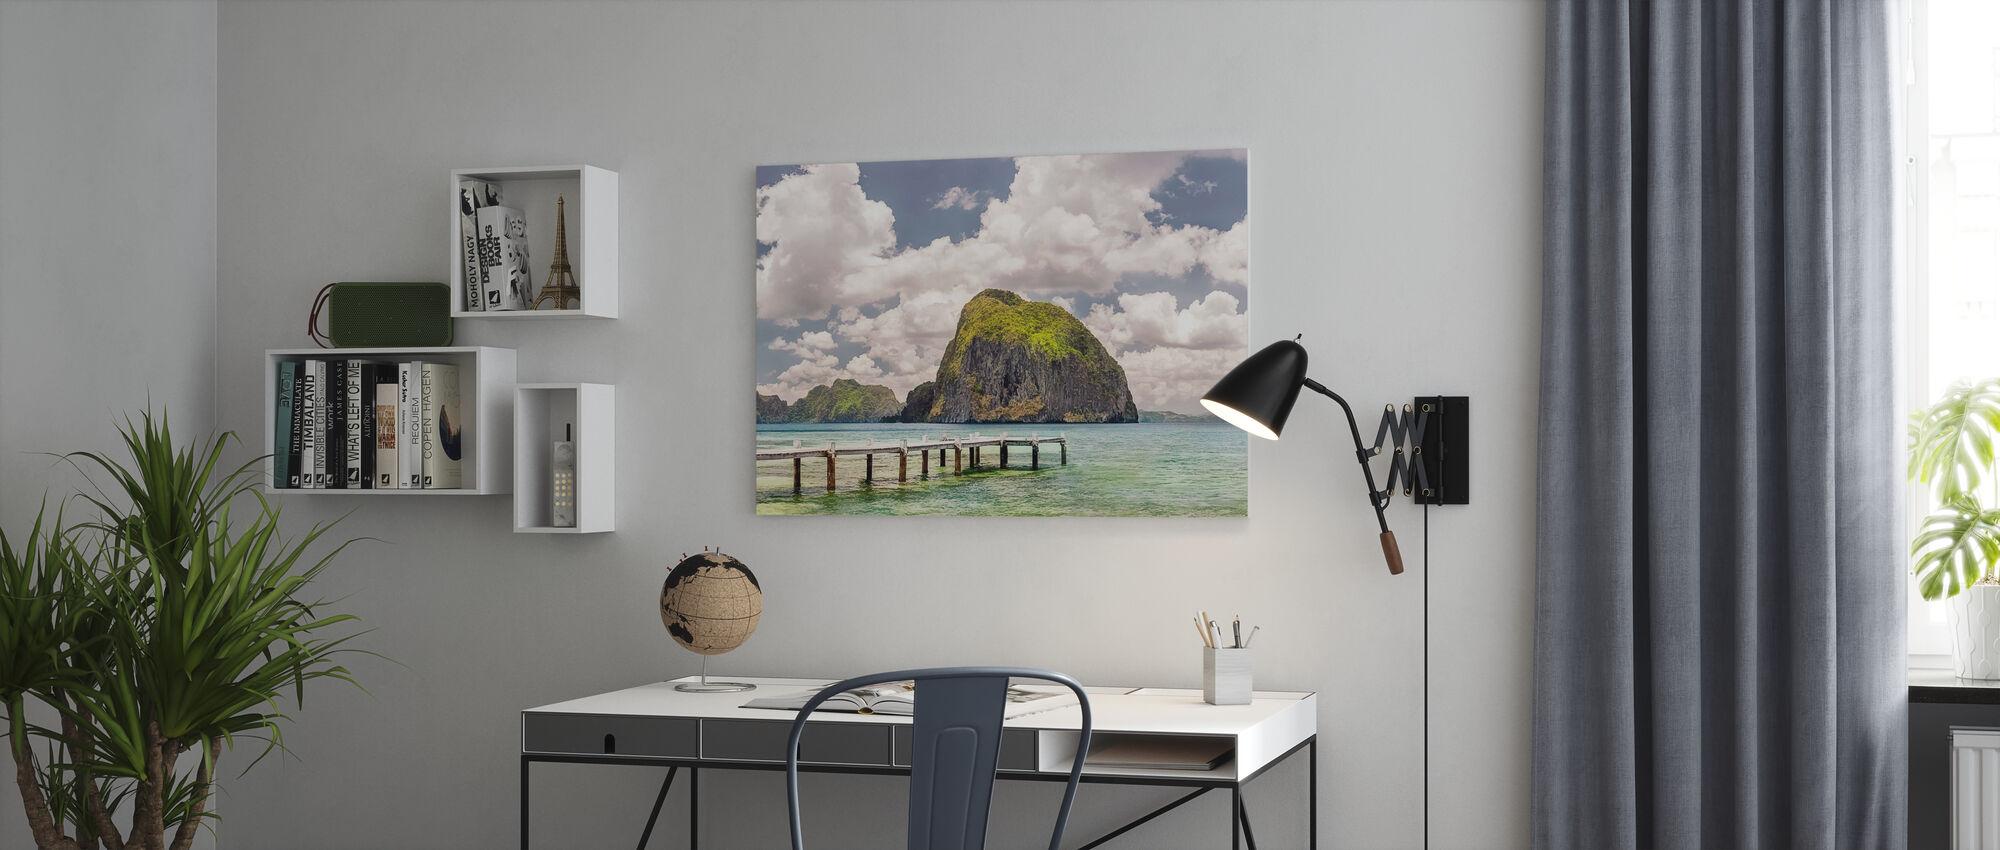 Vacker tropisk strand - Canvastavla - Kontor